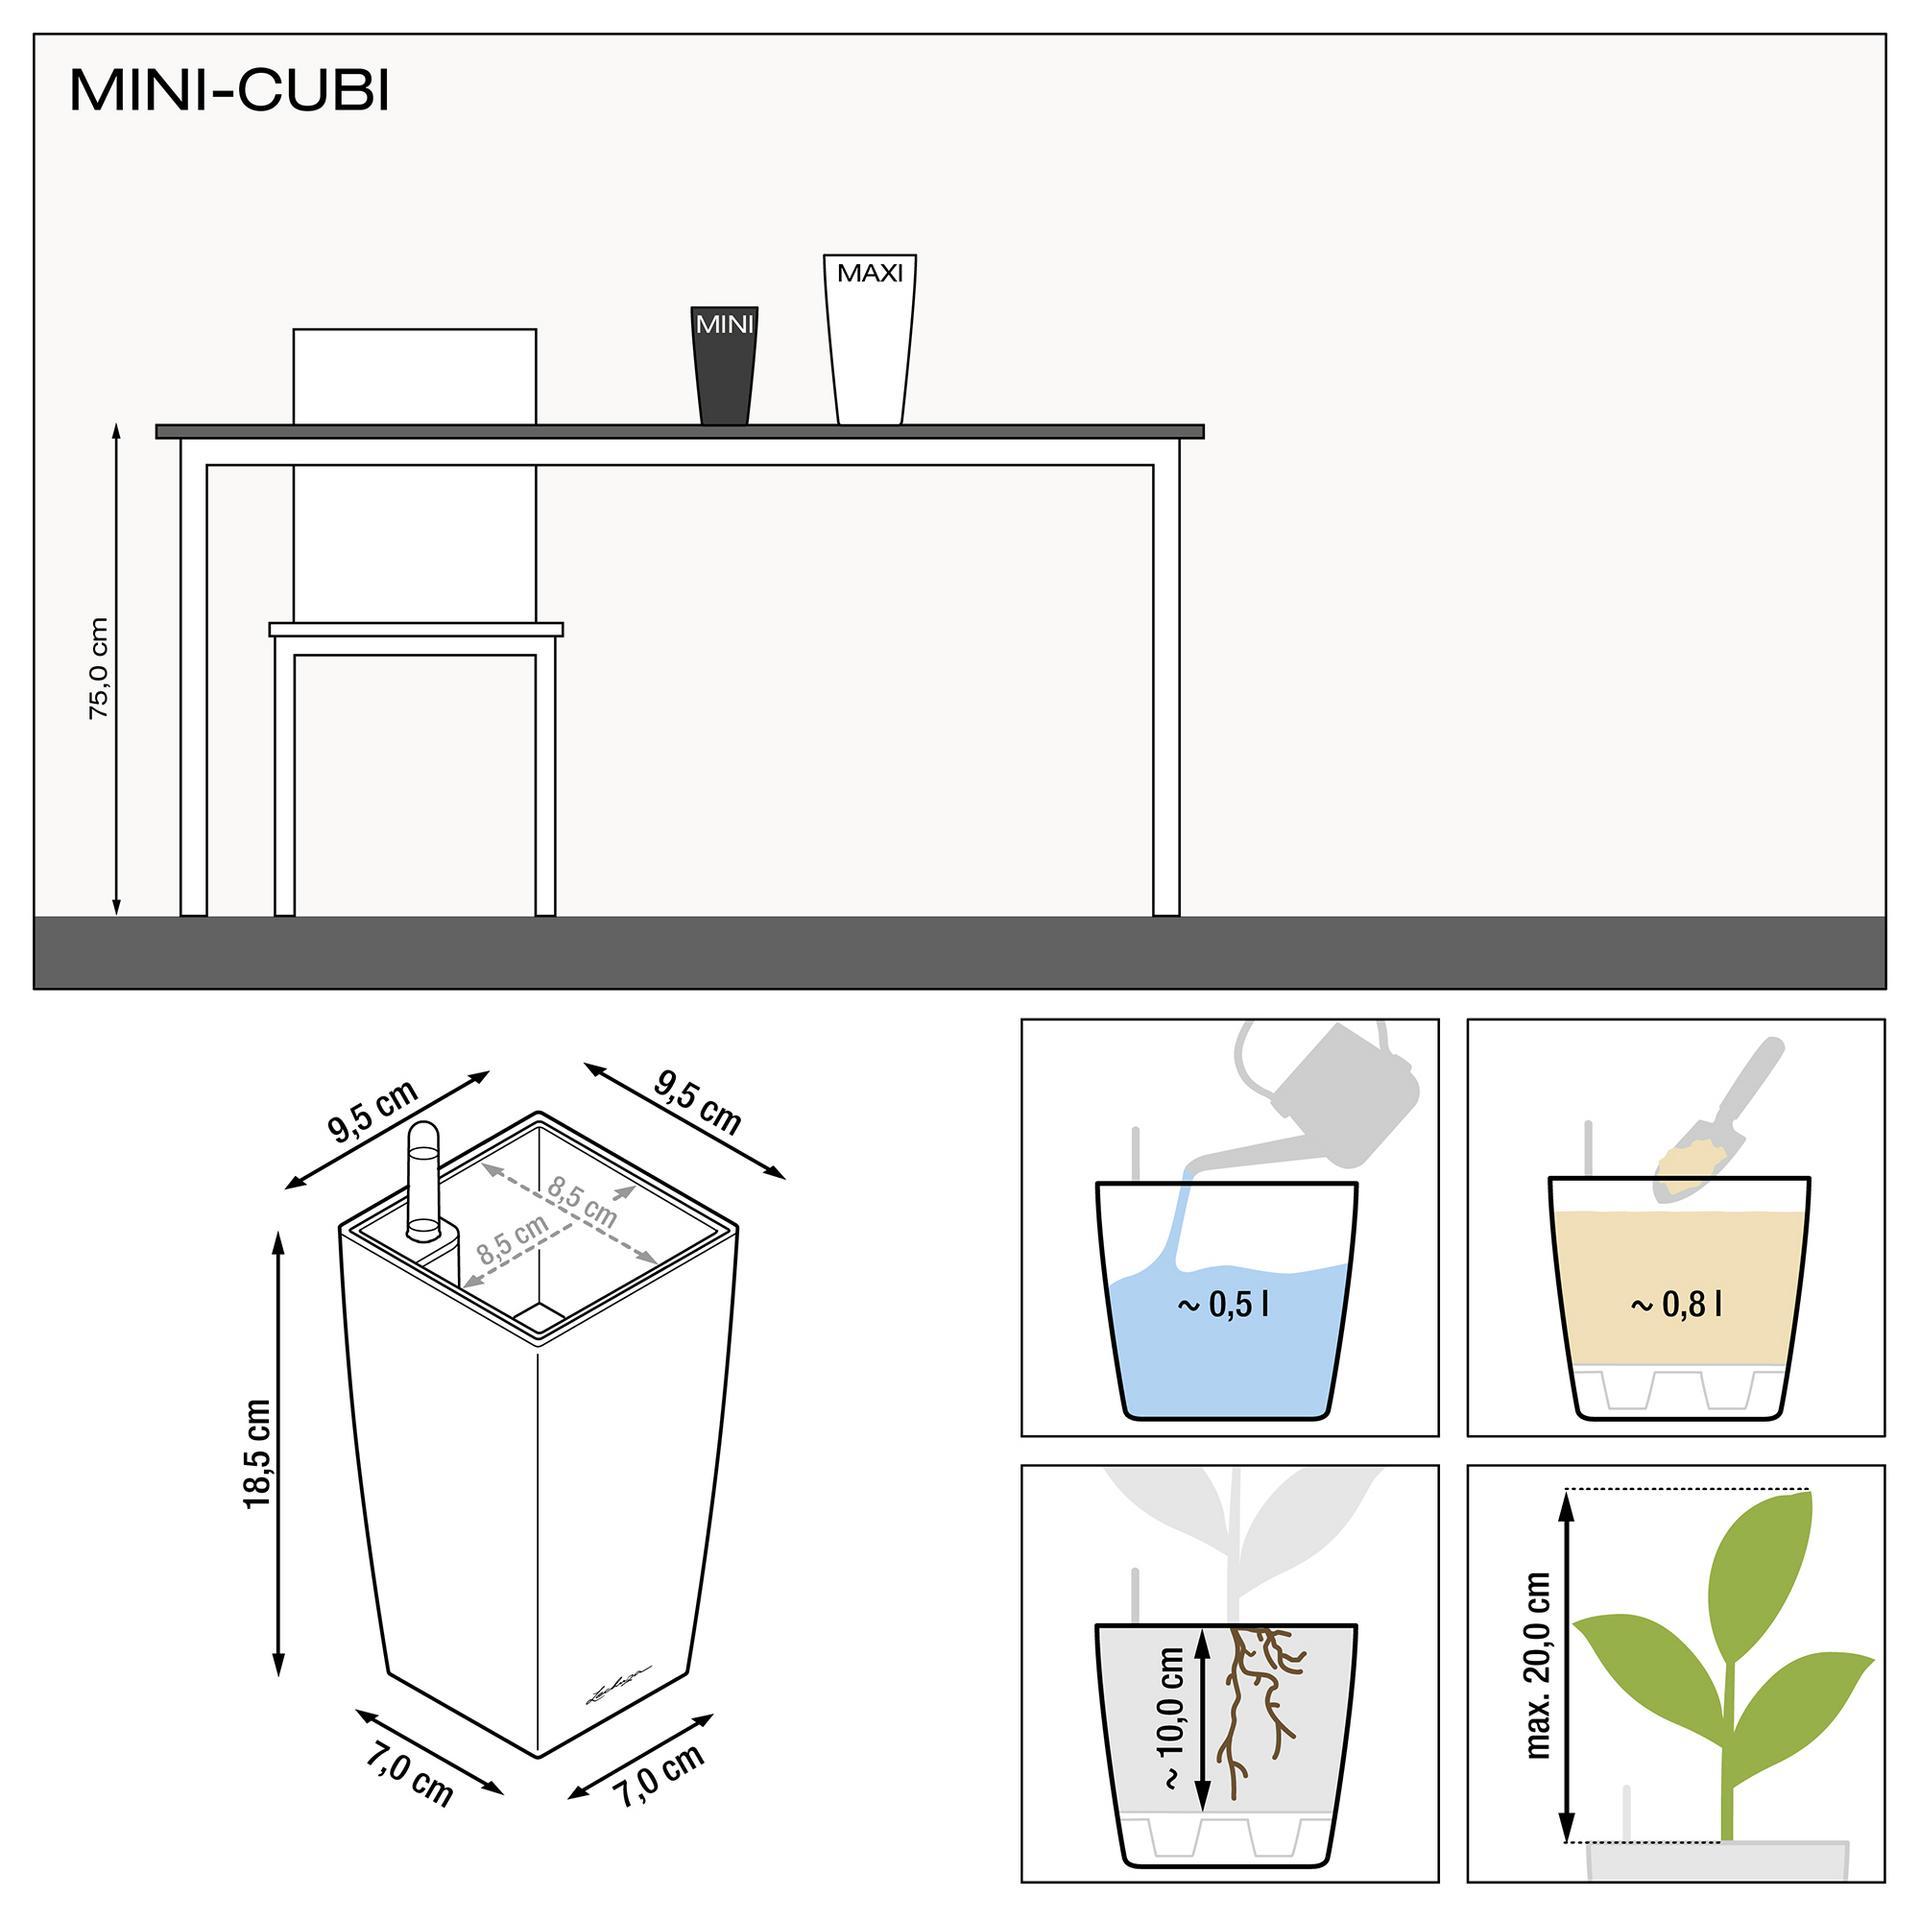 le_minicubi_product_addi_nz